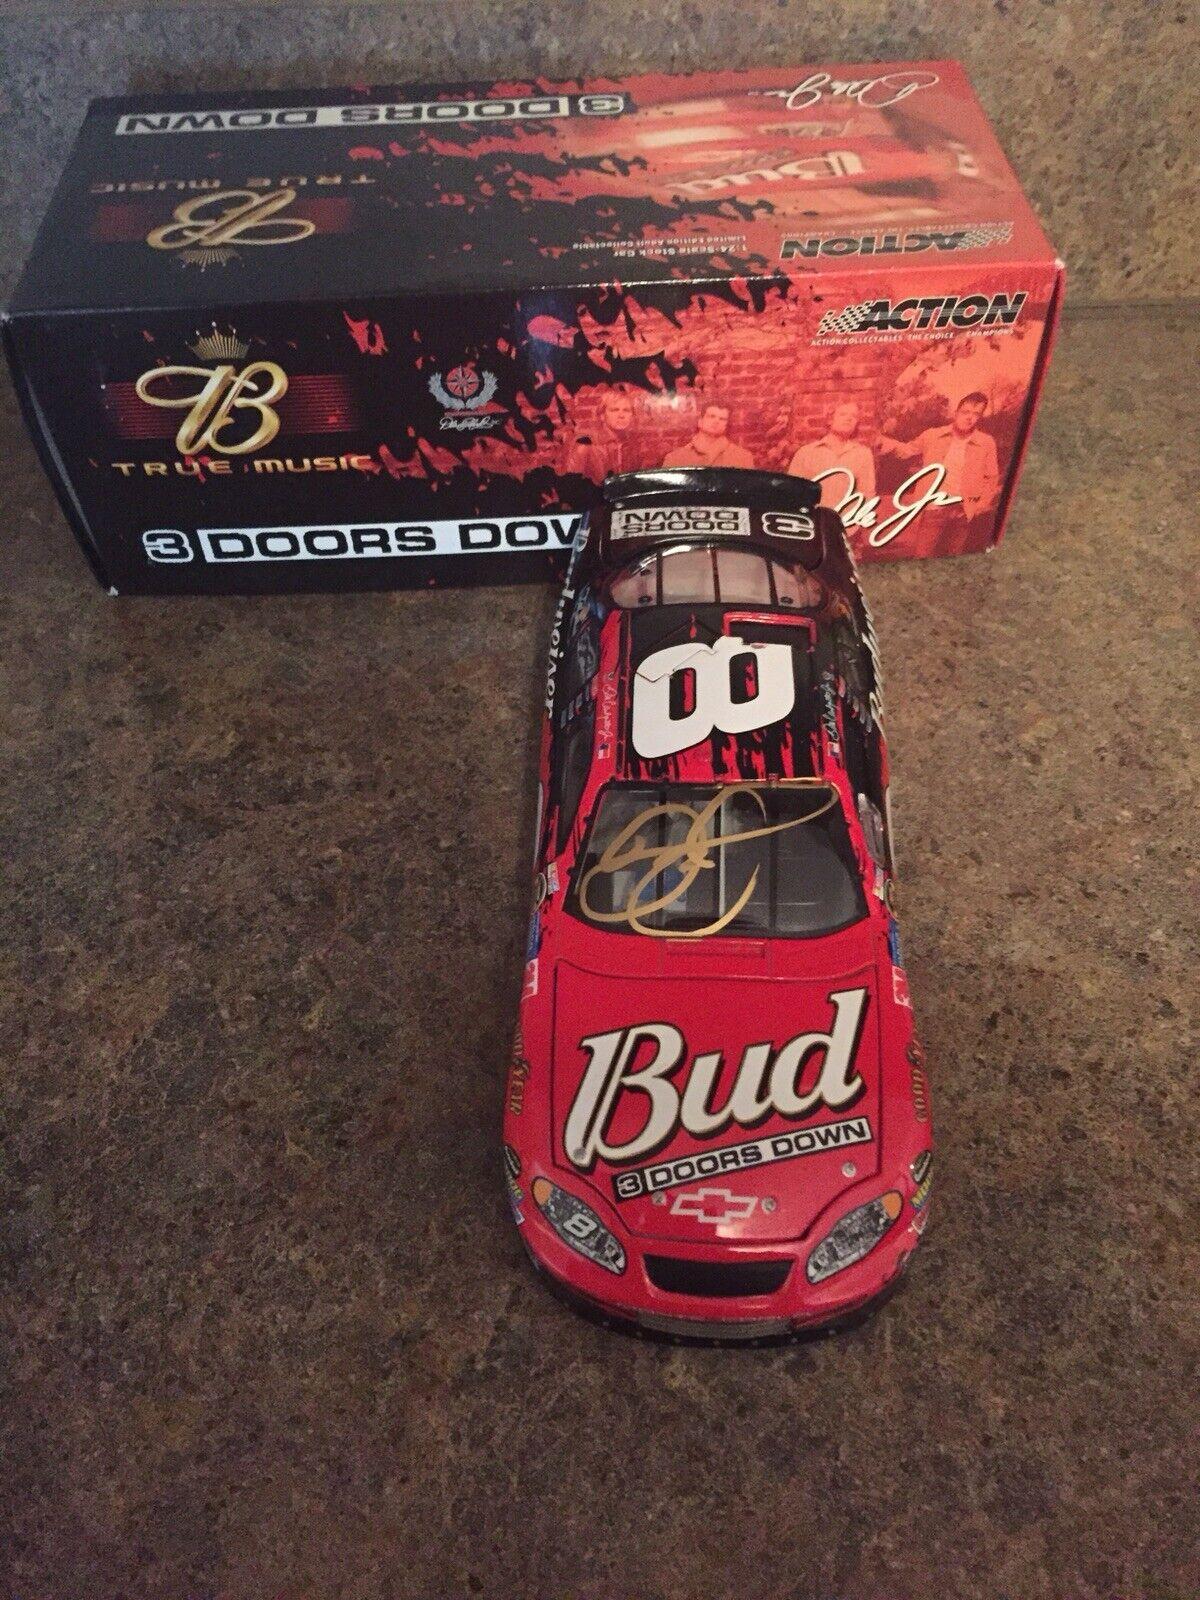 Dale Earnhardt Jr autografiada 1 24  8 3 puertas Budweiser abajo 2005 coche